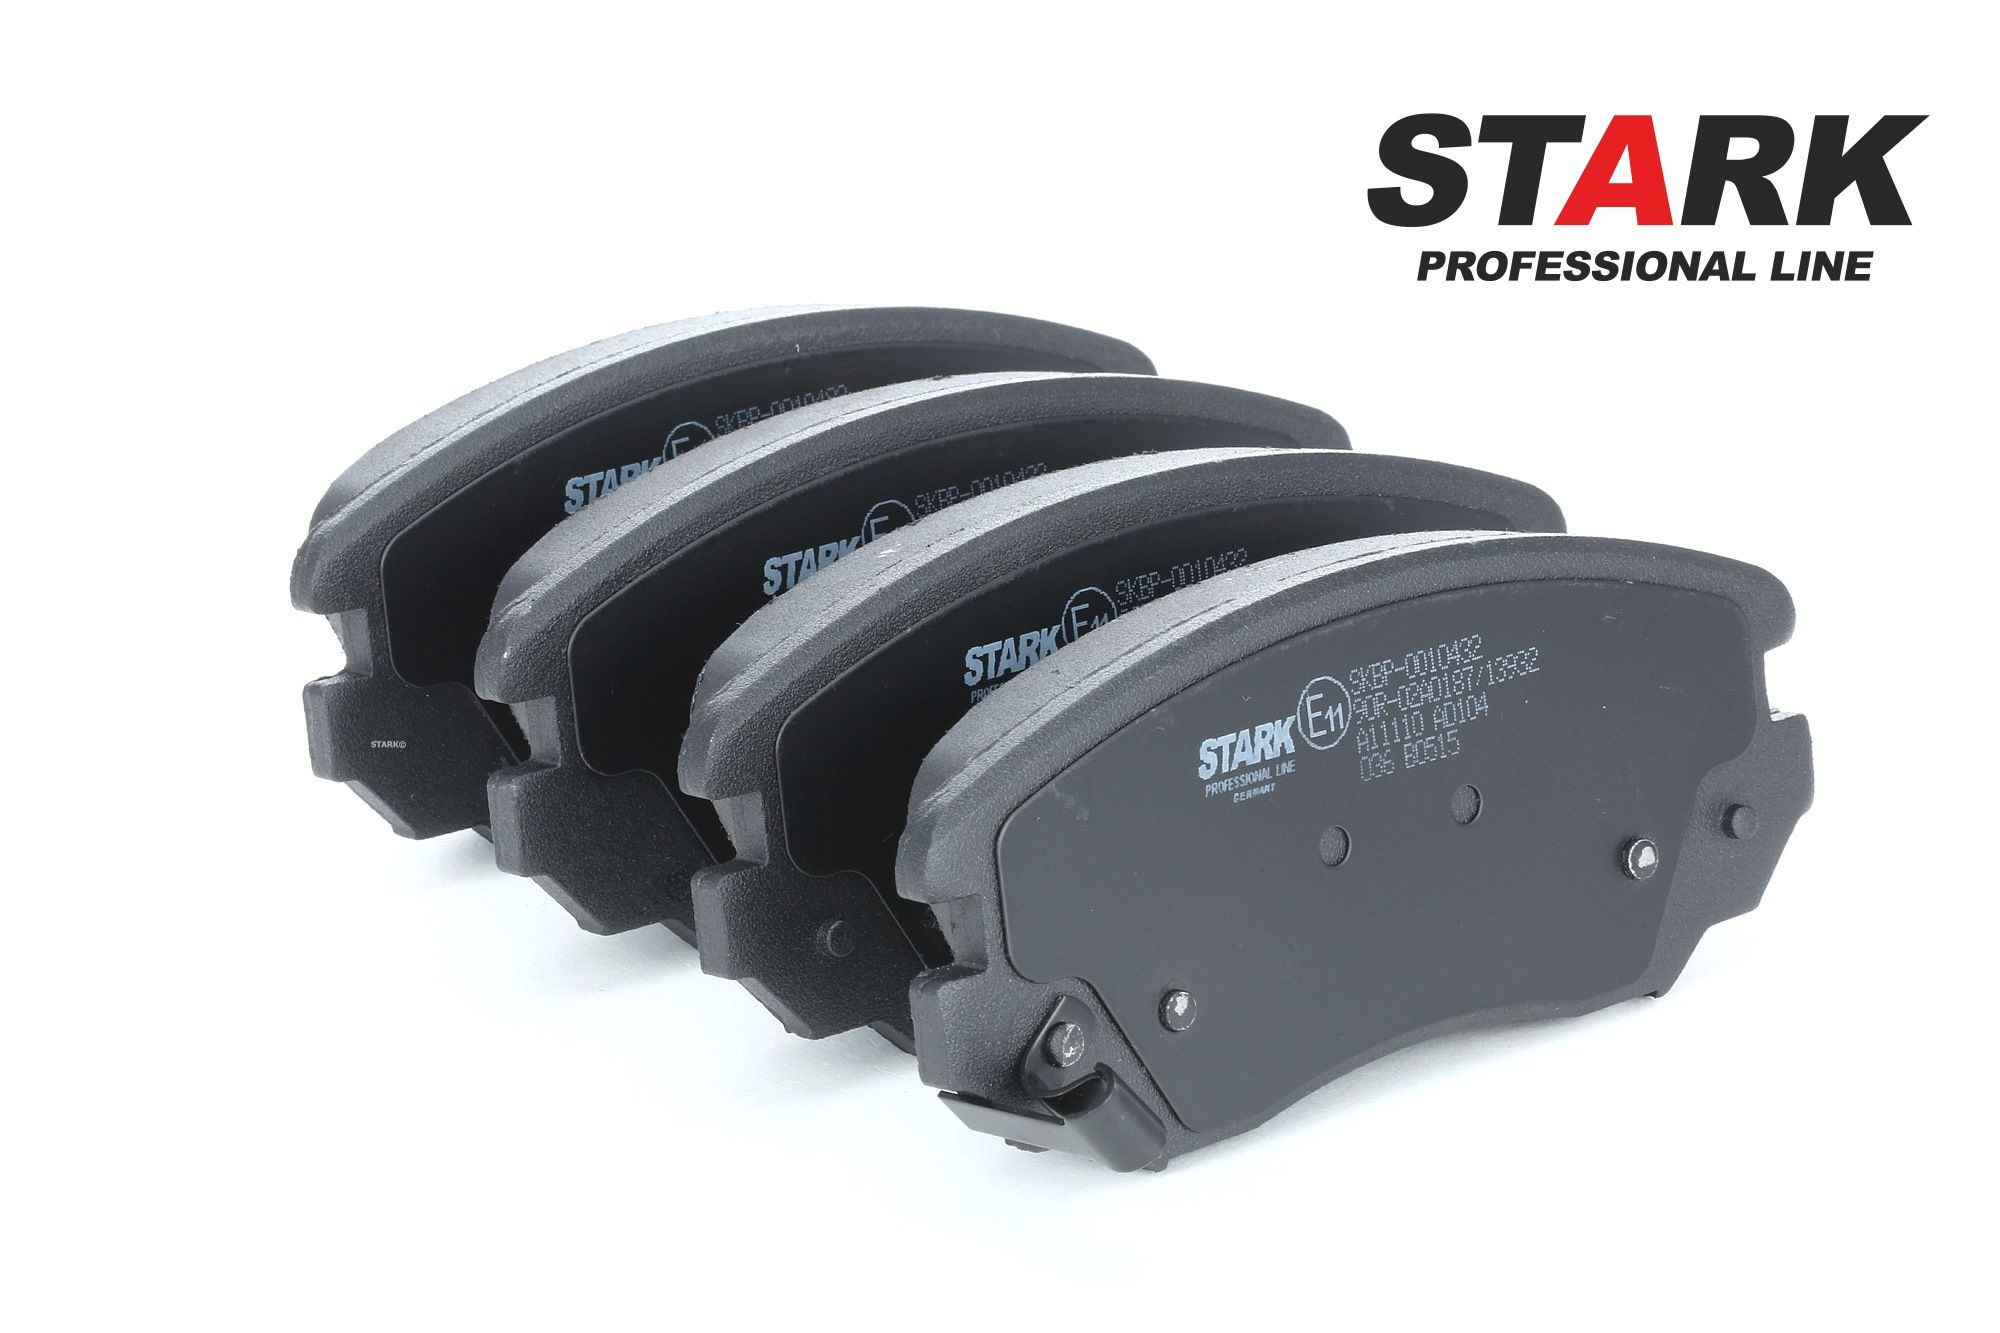 STARK: Original Bremsbeläge SKBP-0010432 (Höhe: 59,6mm, Dicke/Stärke: 19mm)